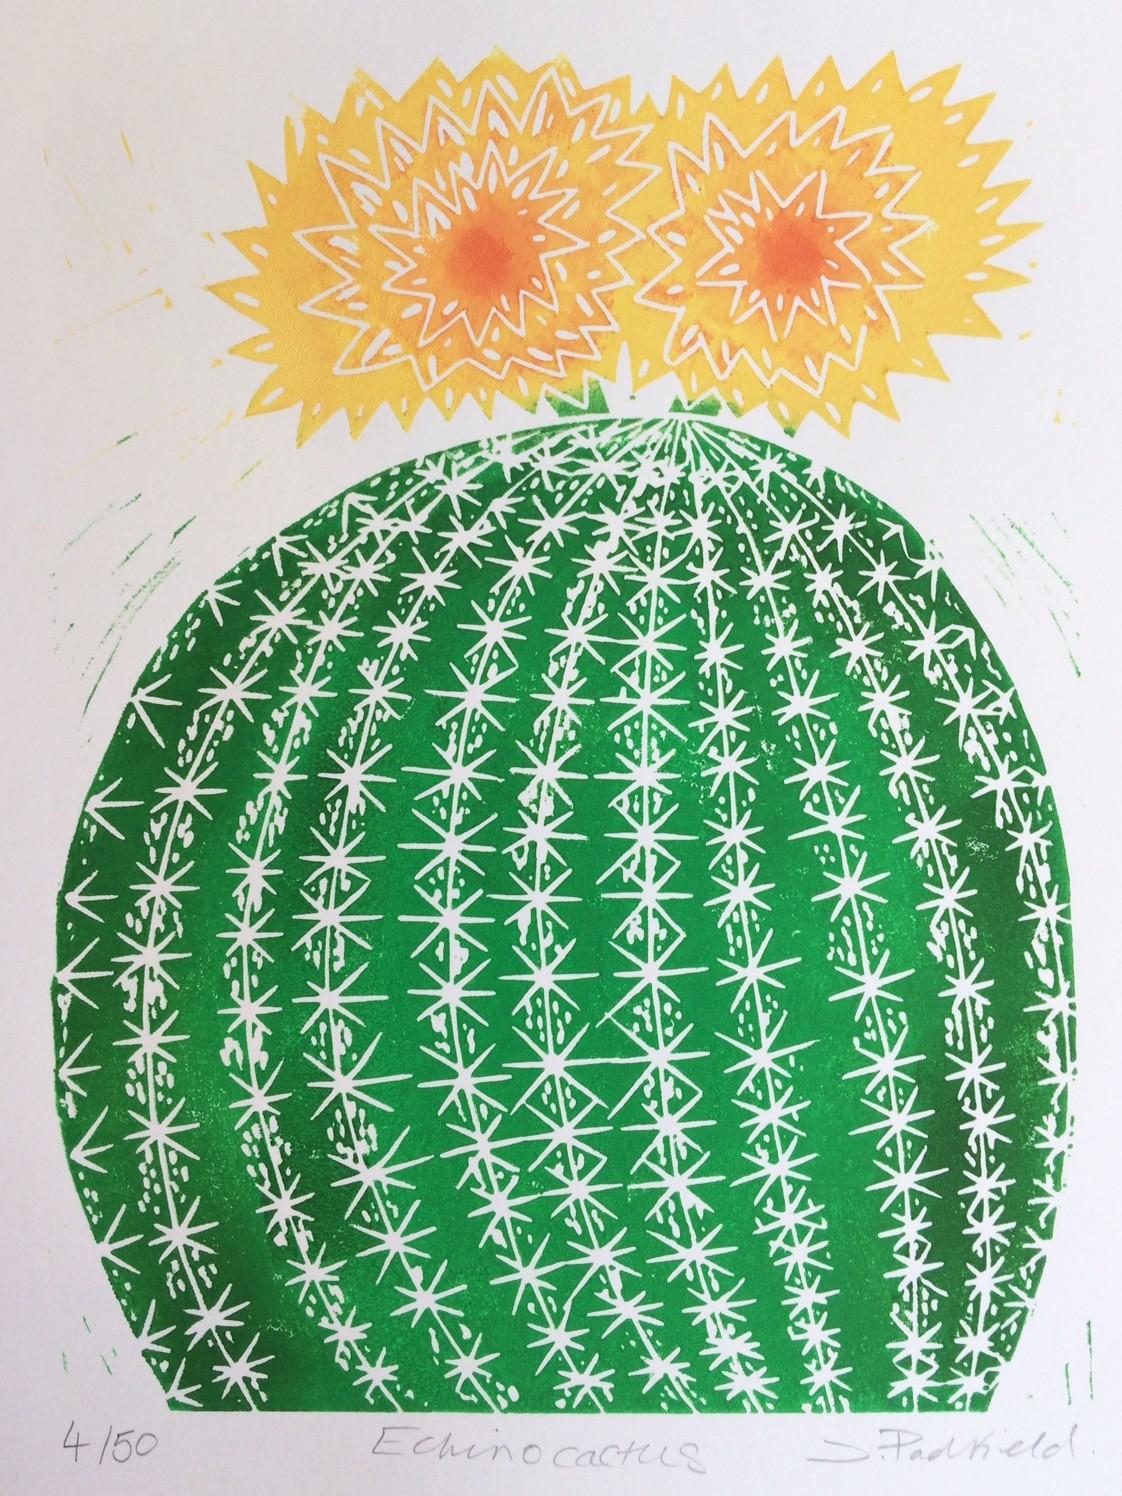 Joanna Padfield, Echino Cactus, 2019, £45, linocut, limited edition of 50, Wychwood Art